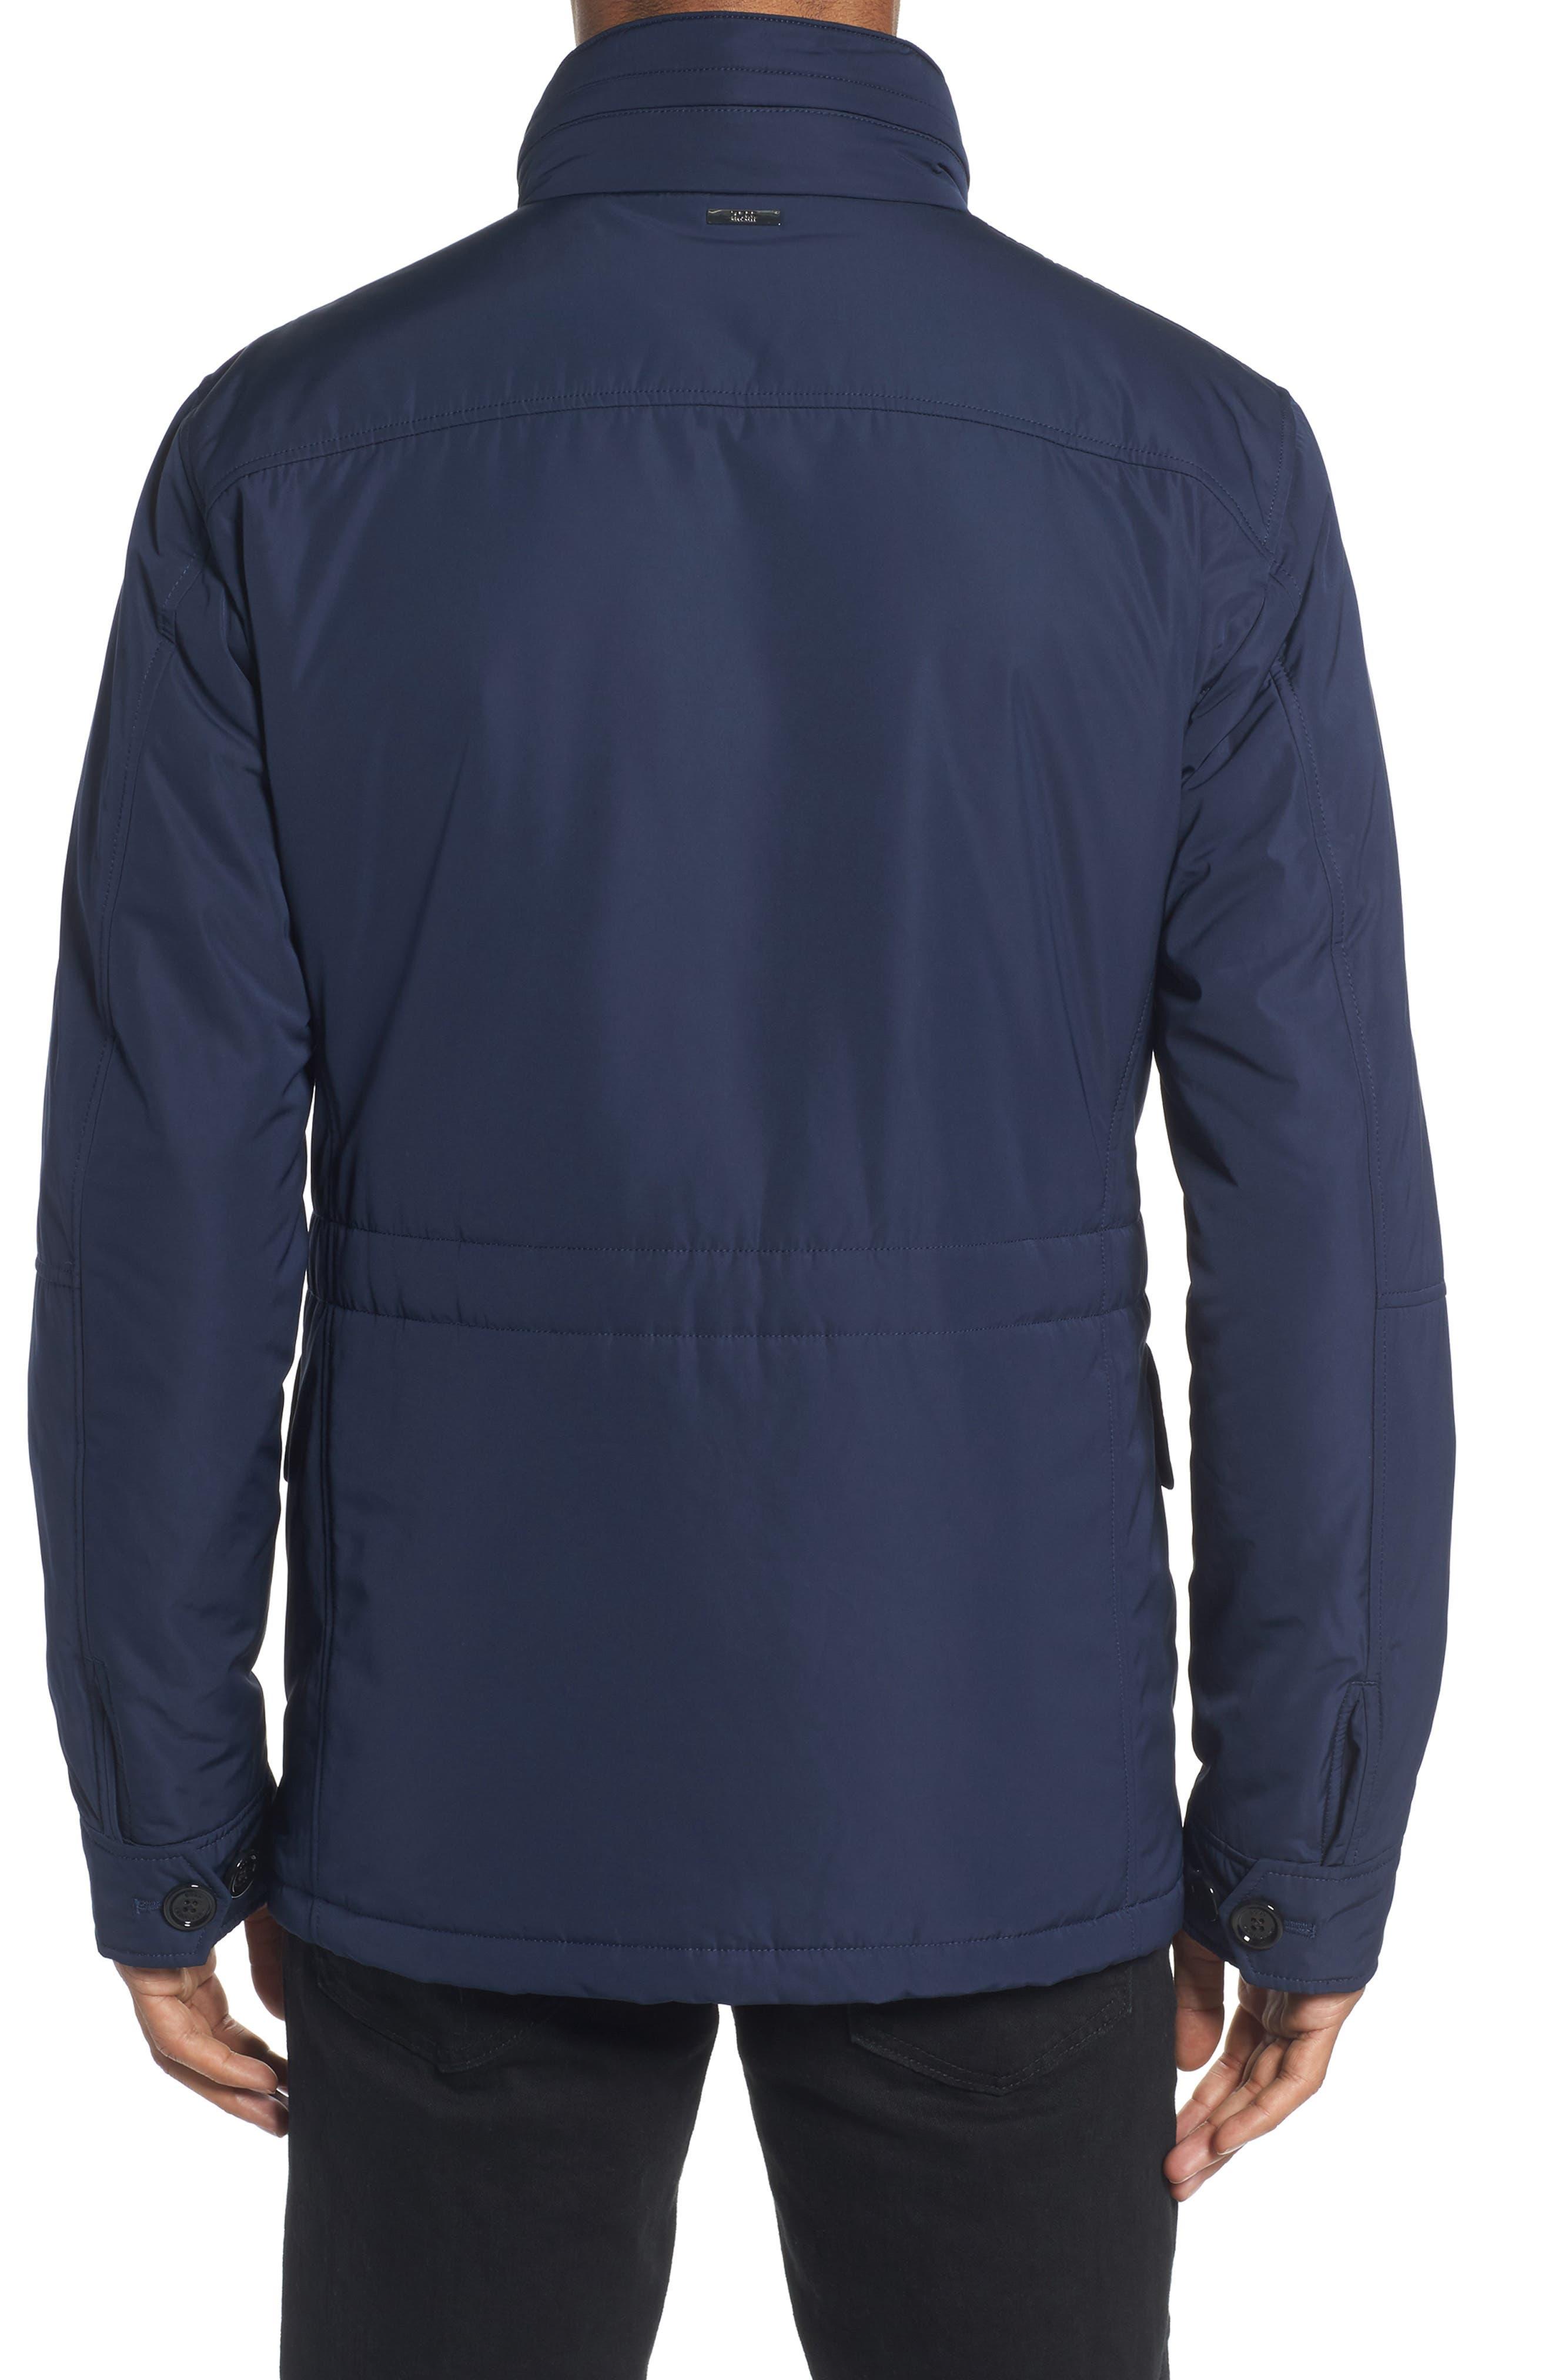 Cento Field Jacket,                             Alternate thumbnail 2, color,